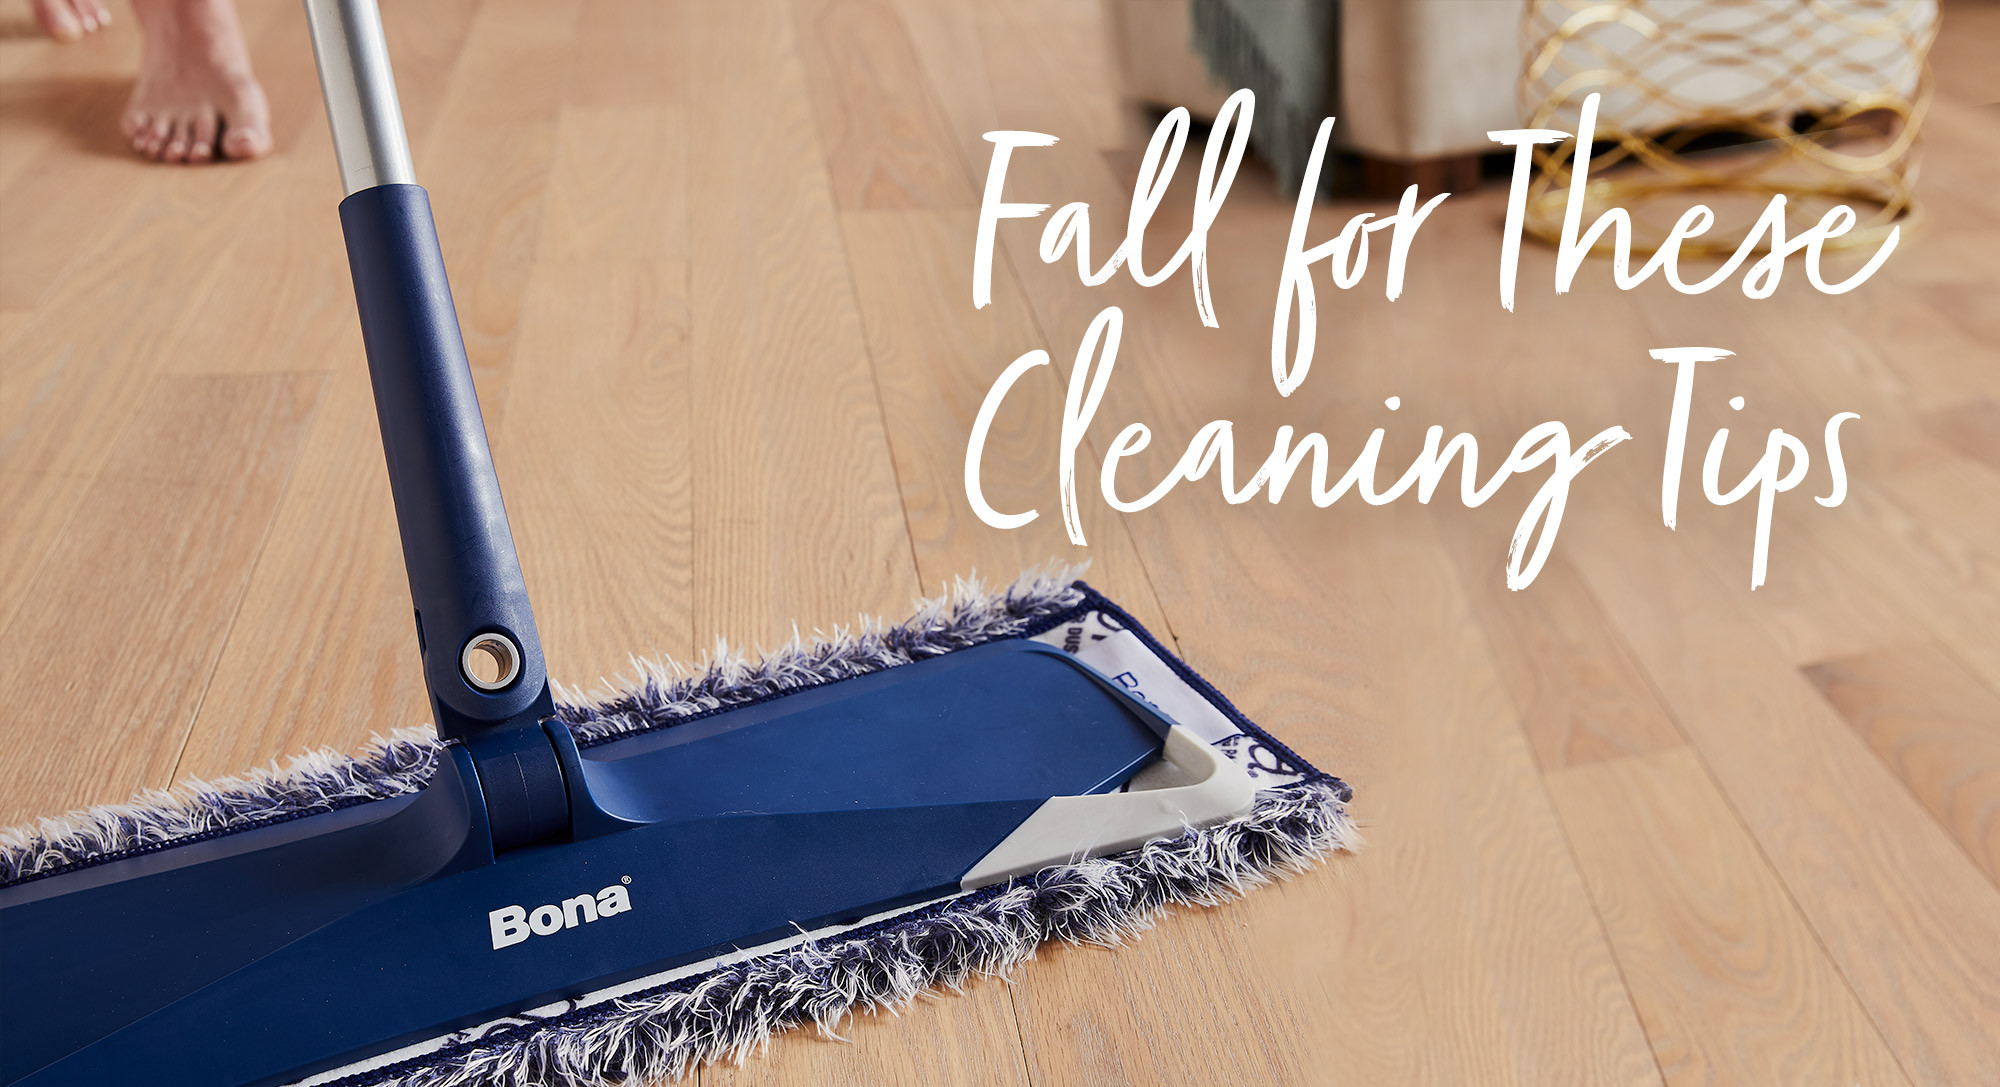 satin finish hardwood flooring toronto of home bona us throughout fall feature2